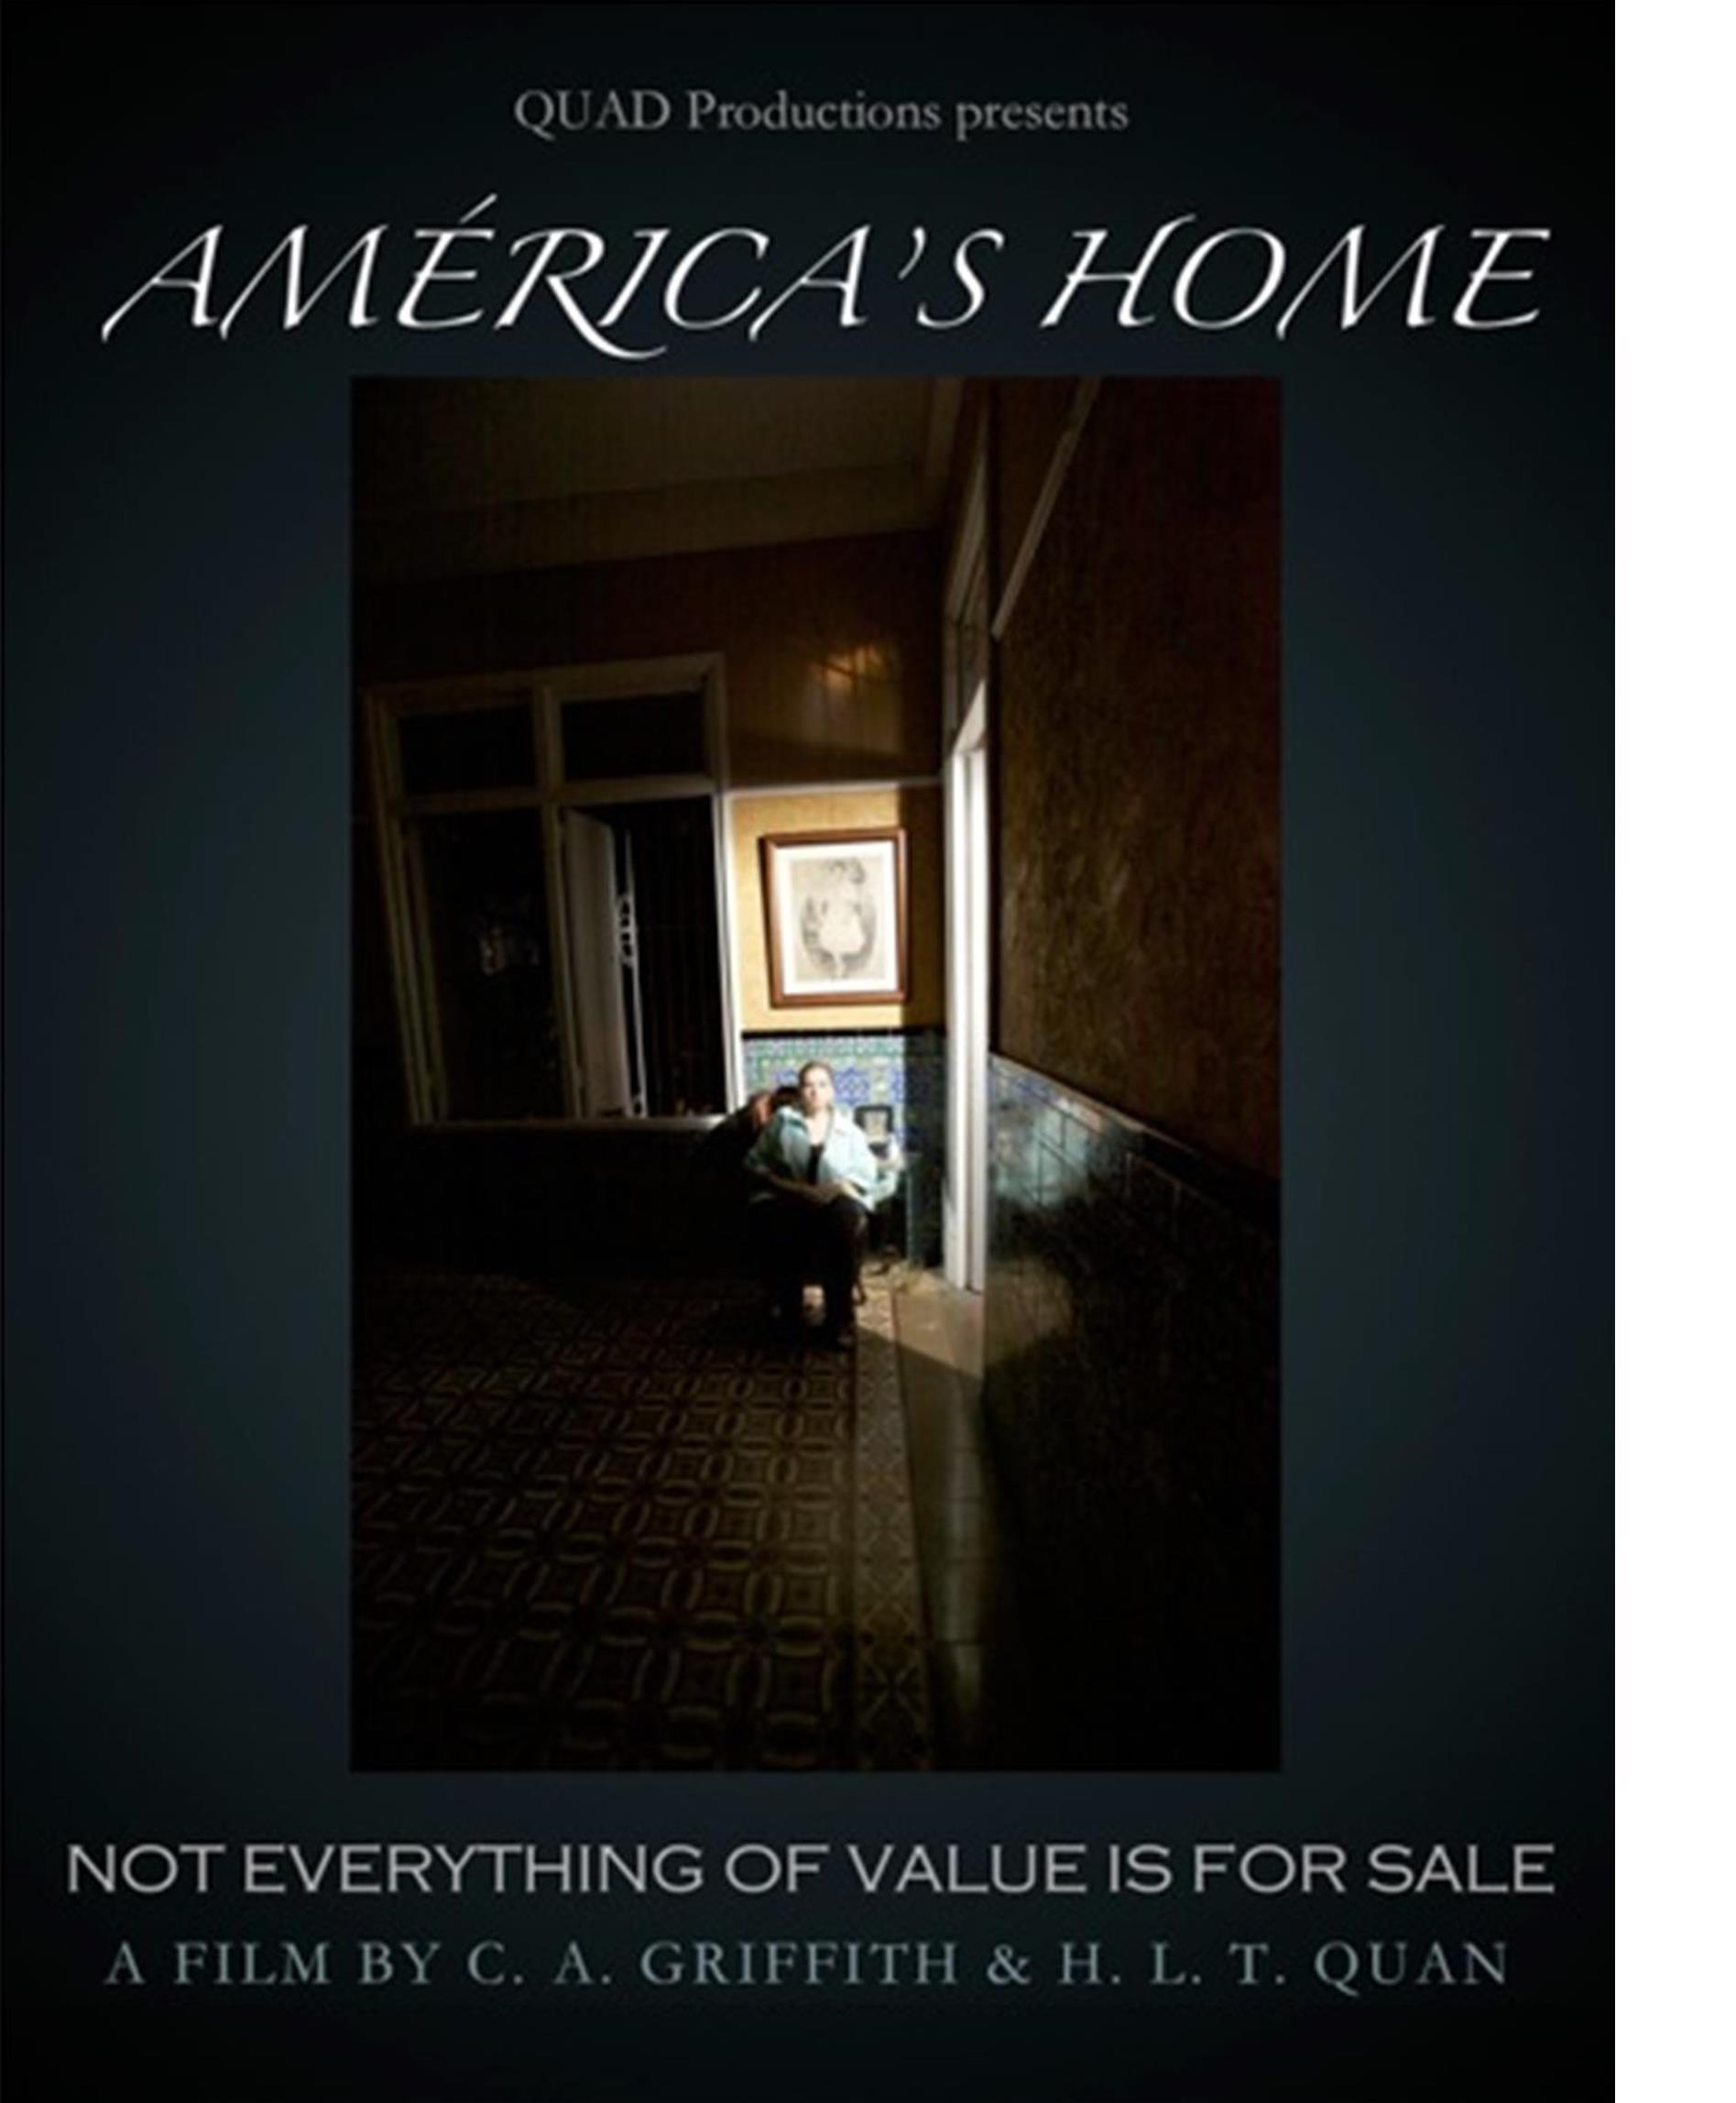 America's Home Film Poster